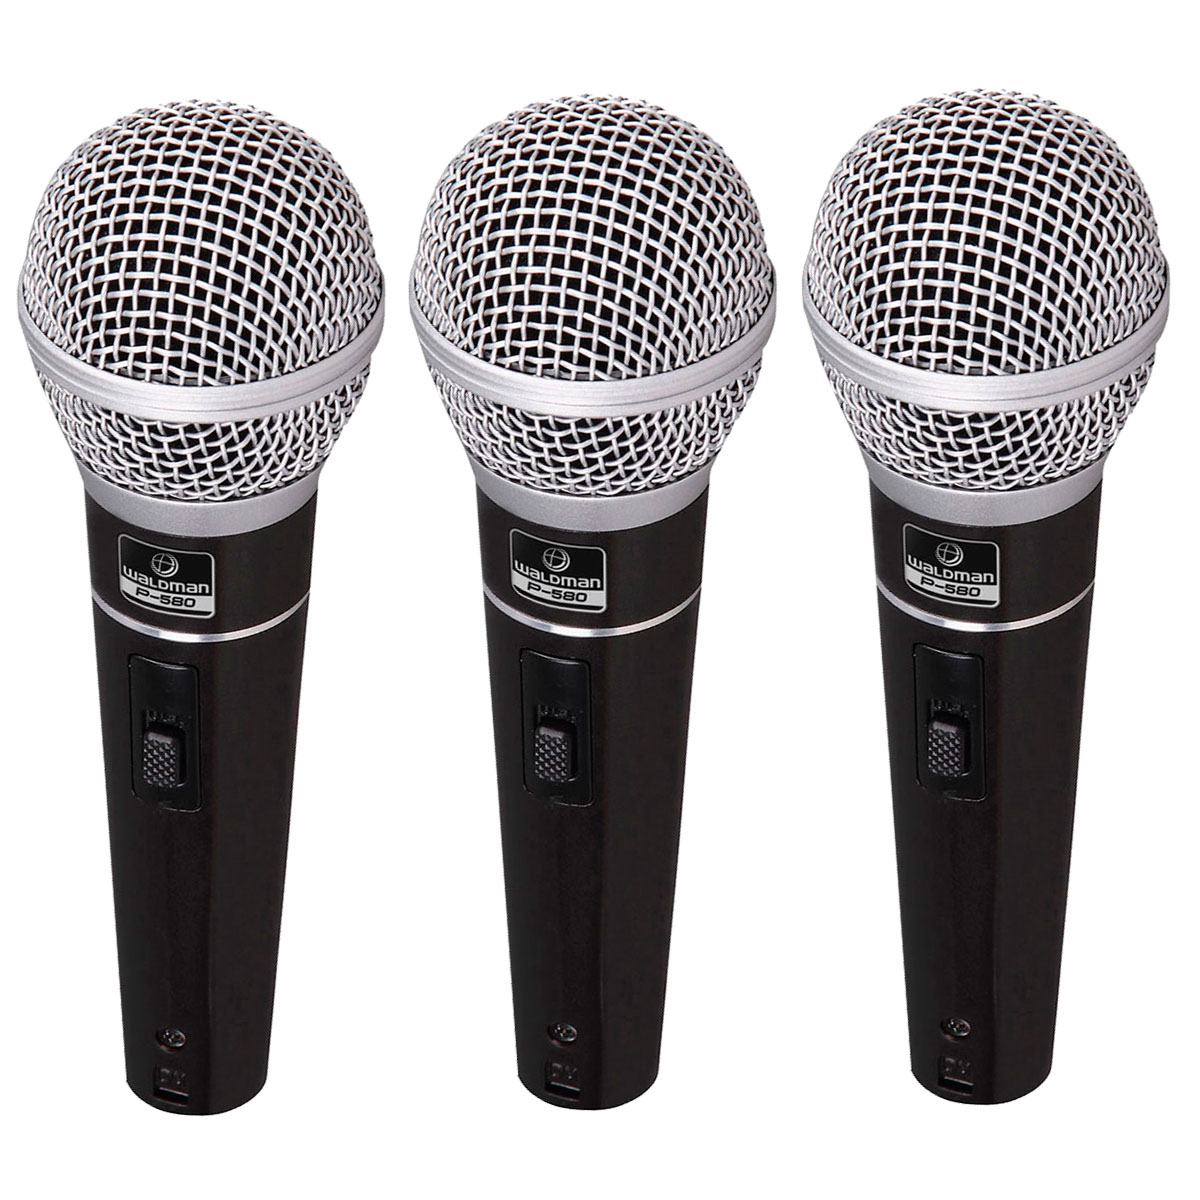 P5803PC - Kit 3 Microfones c/ Fio de M�o P 580 3PC - Waldman